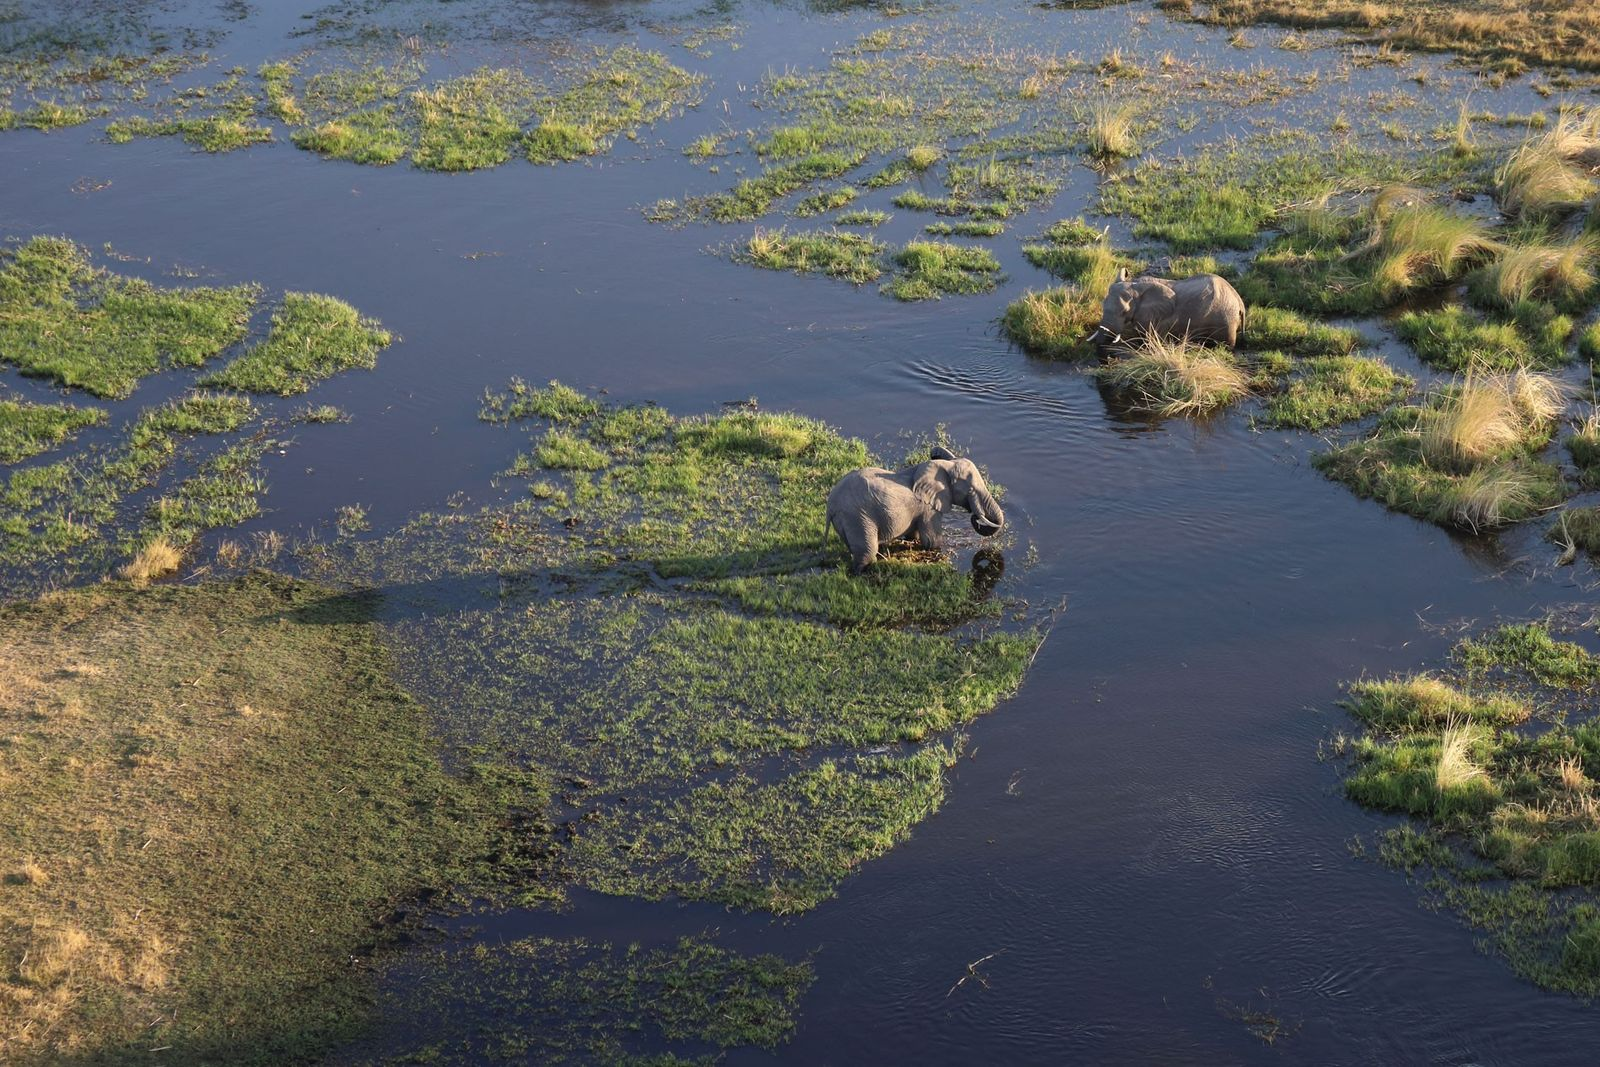 Into the Okavango Delta: a portrait of Africa's wildest conservation destination